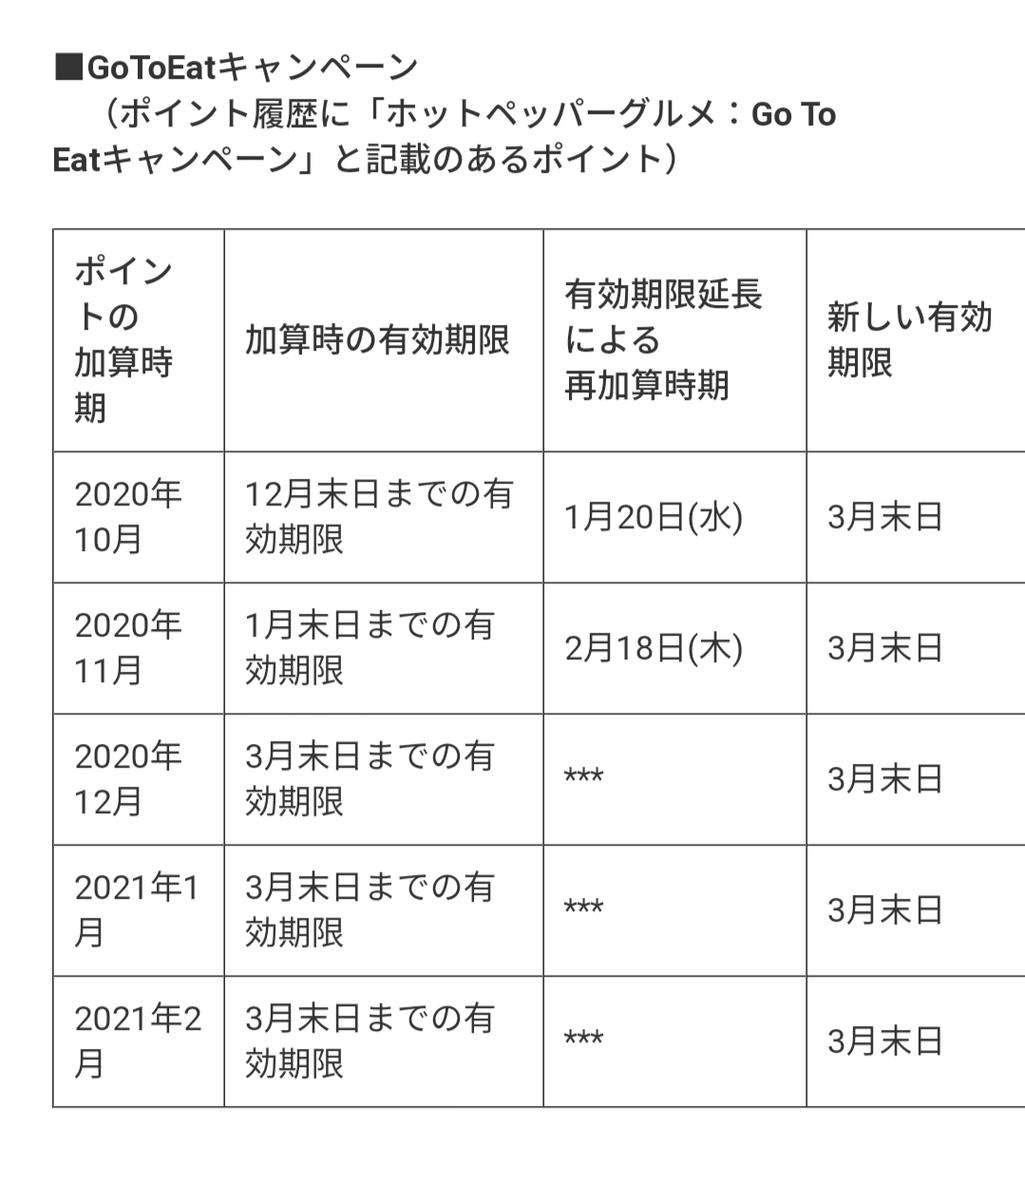 f:id:g-tomatoma:20210203063802j:plain